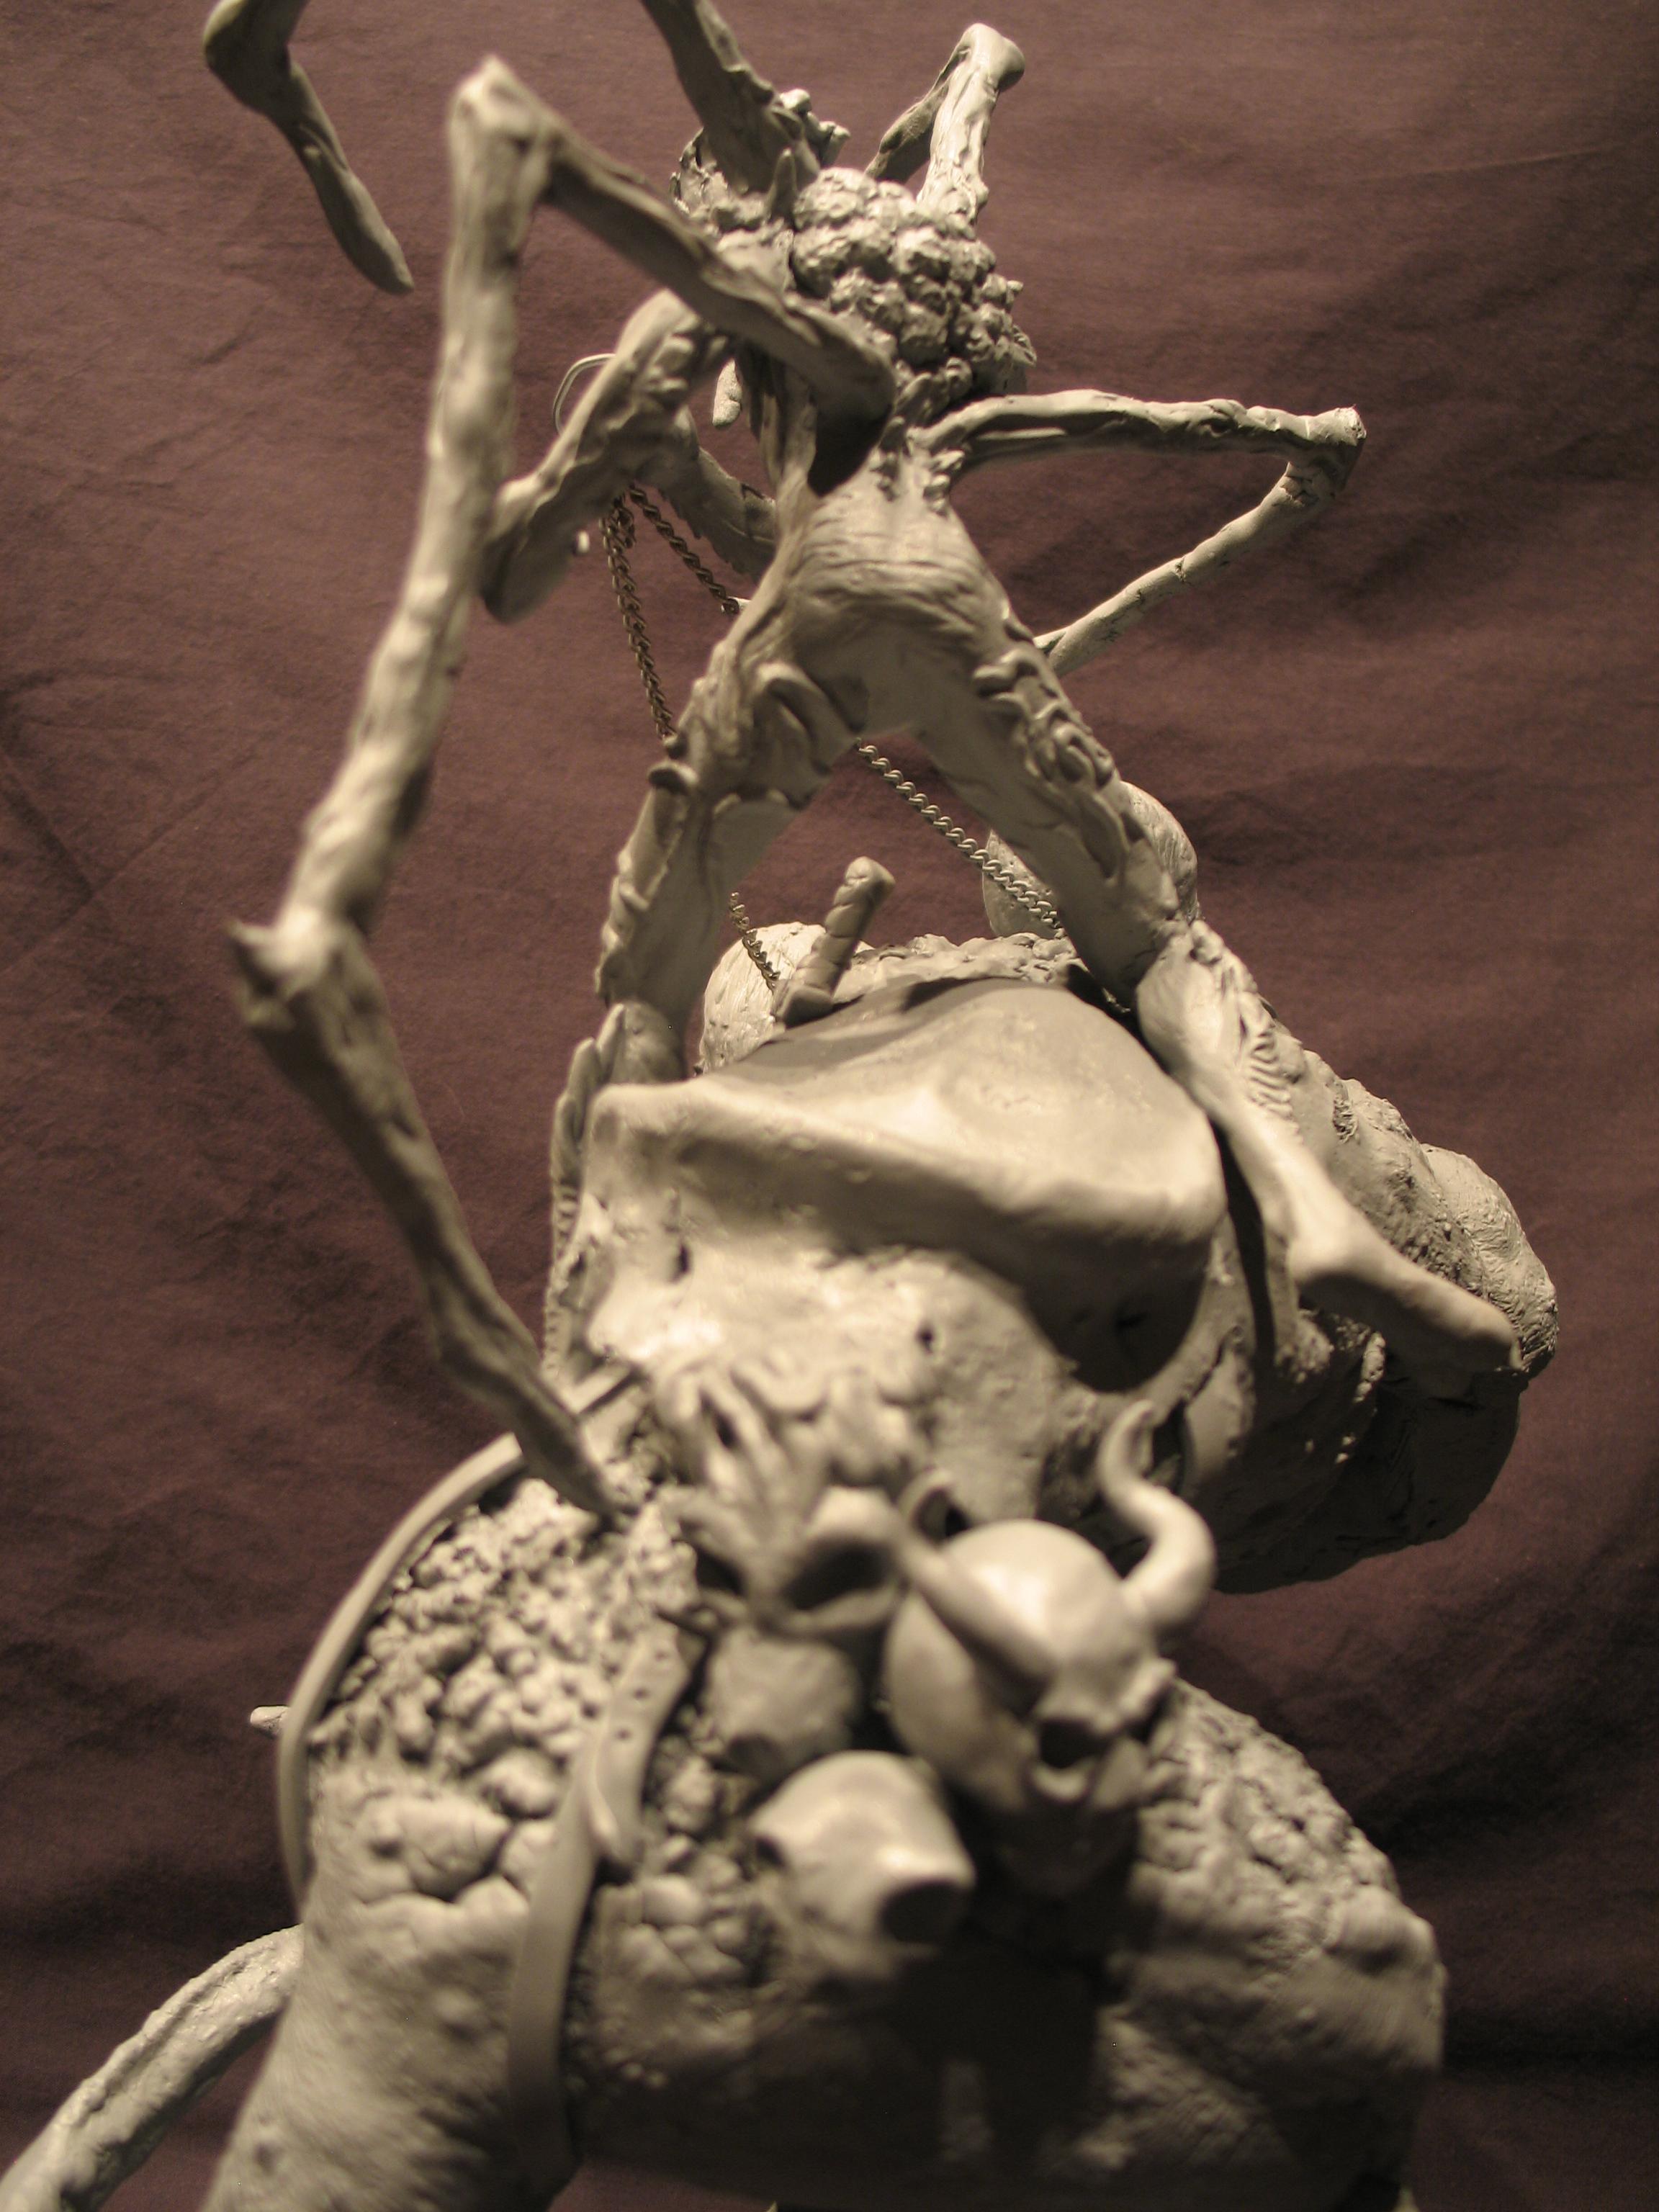 Spiderzero Riding the Shiflett Monster (Concours Shiflett 2) S181